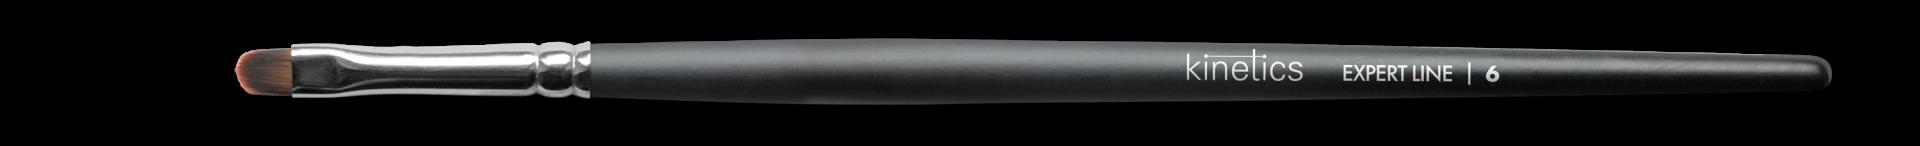 Kinetics Expert Line Gel Brush size 6